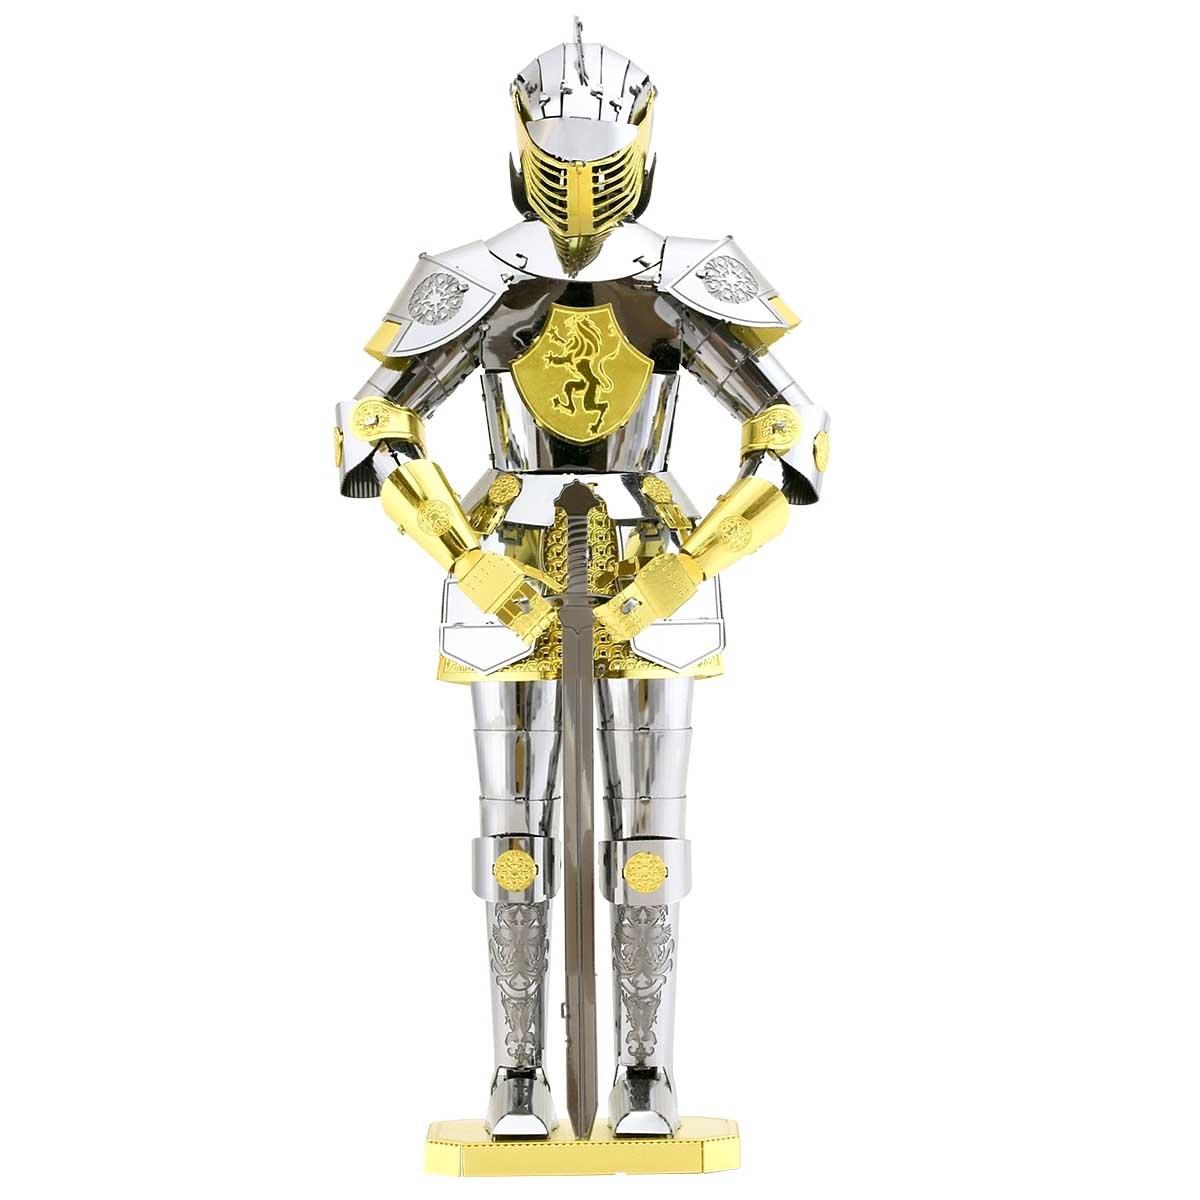 European Knight Armor Military / Warfare Metal Puzzles